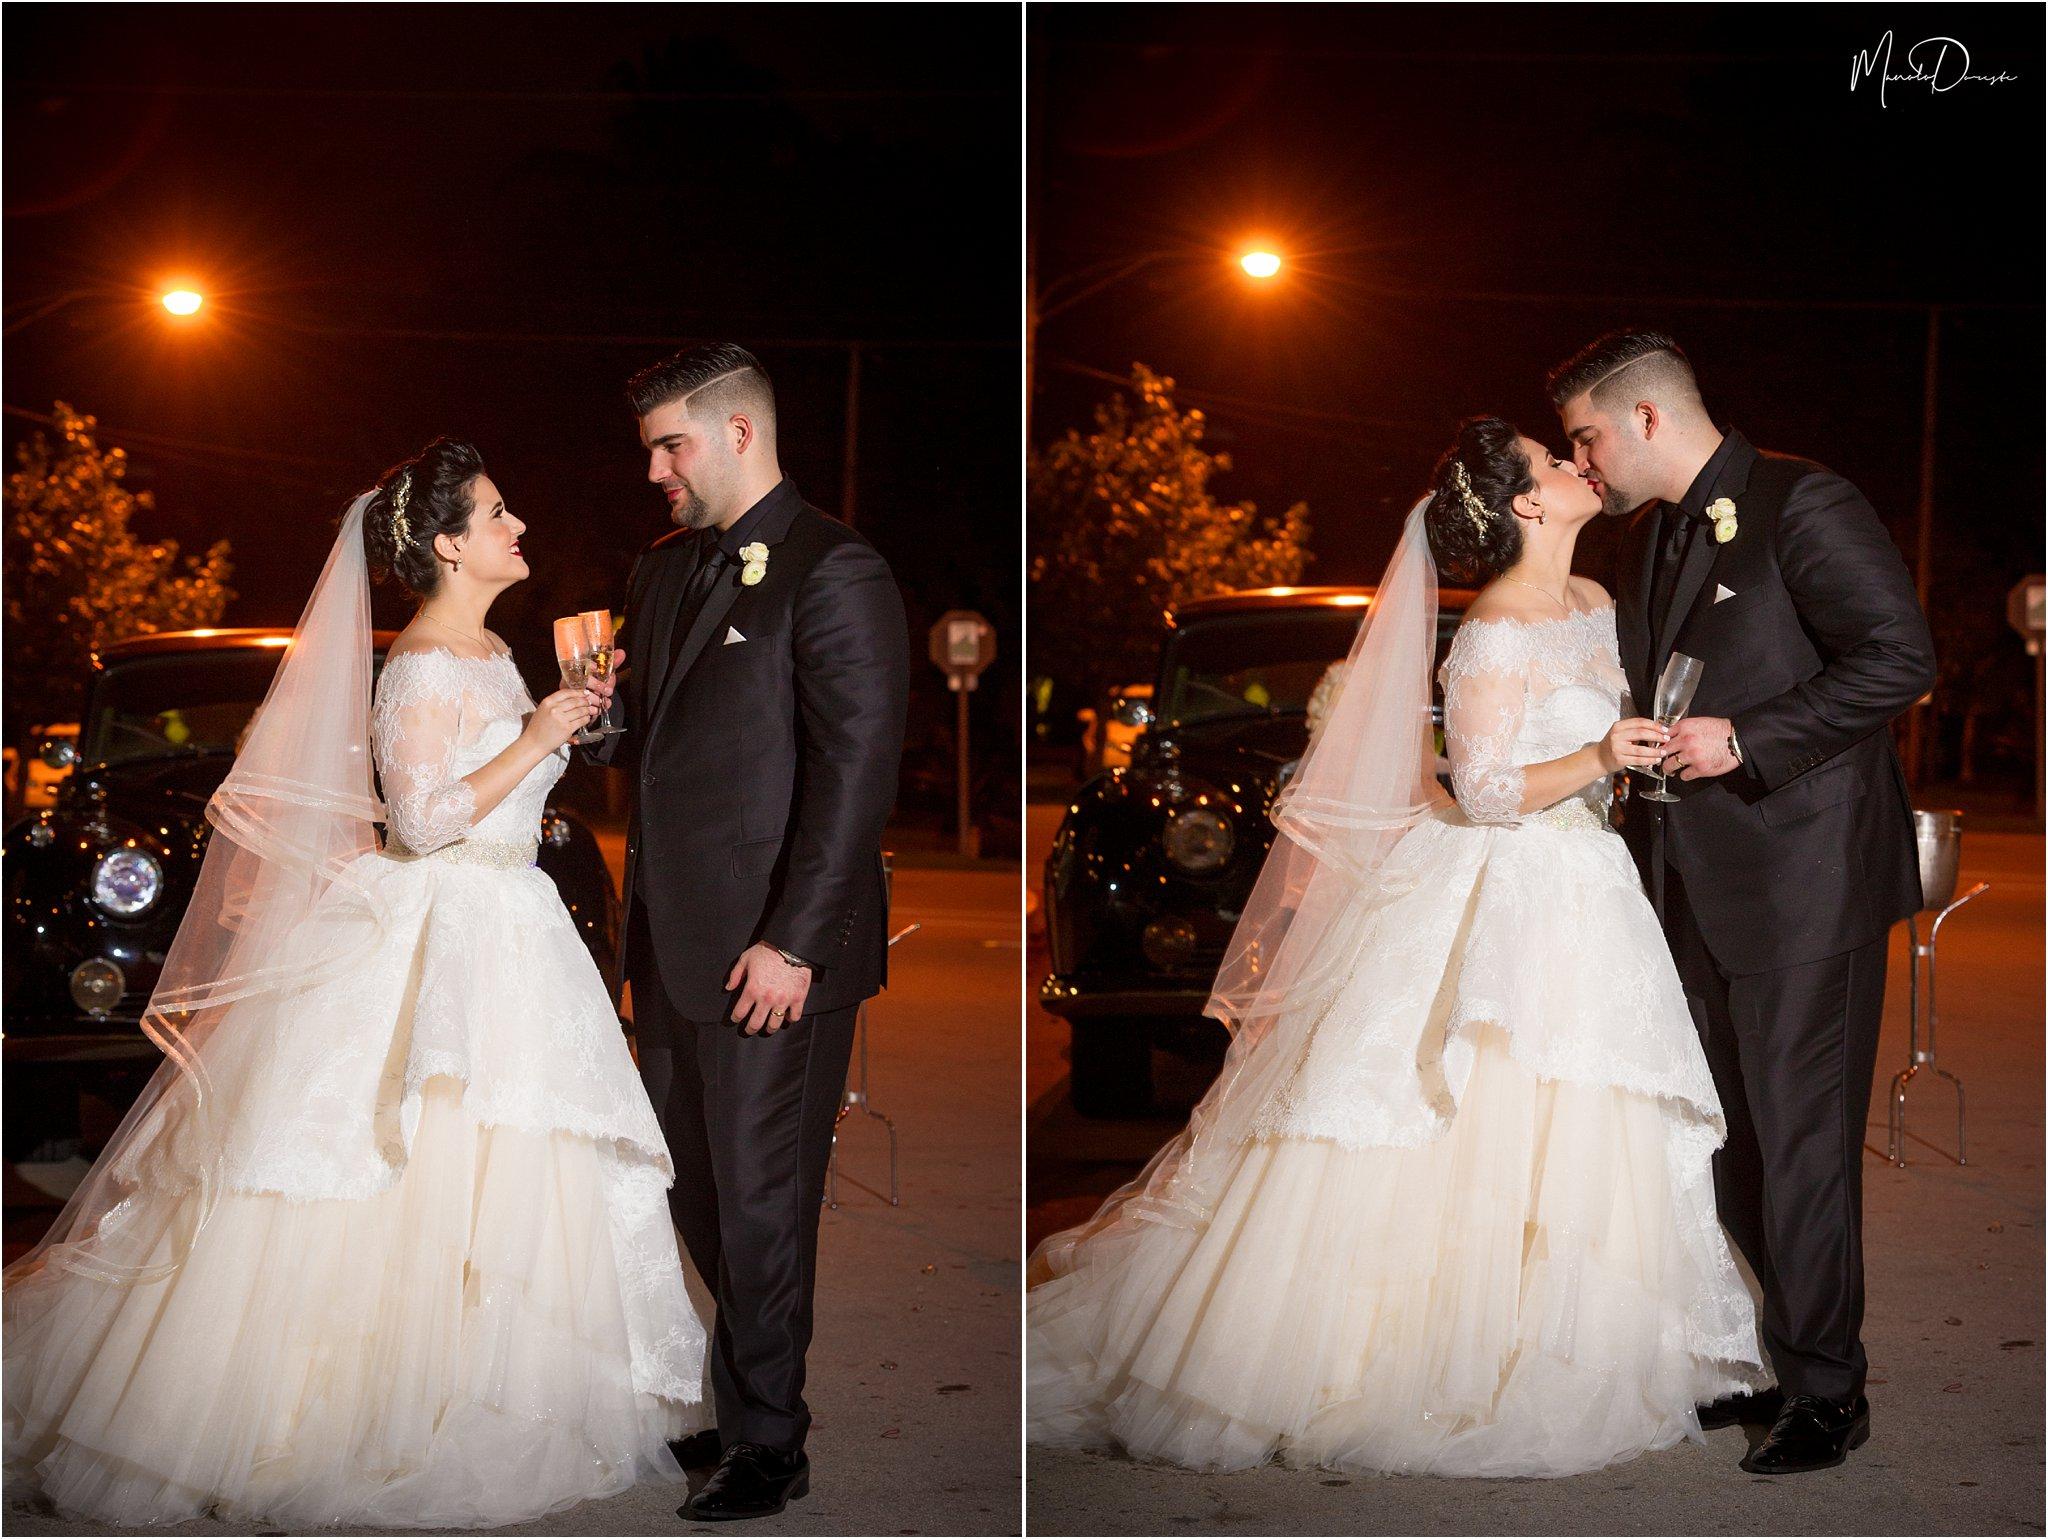 00966_ManoloDoreste_InFocusStudios_Wedding_Family_Photography_Miami_MiamiPhotographer.jpg